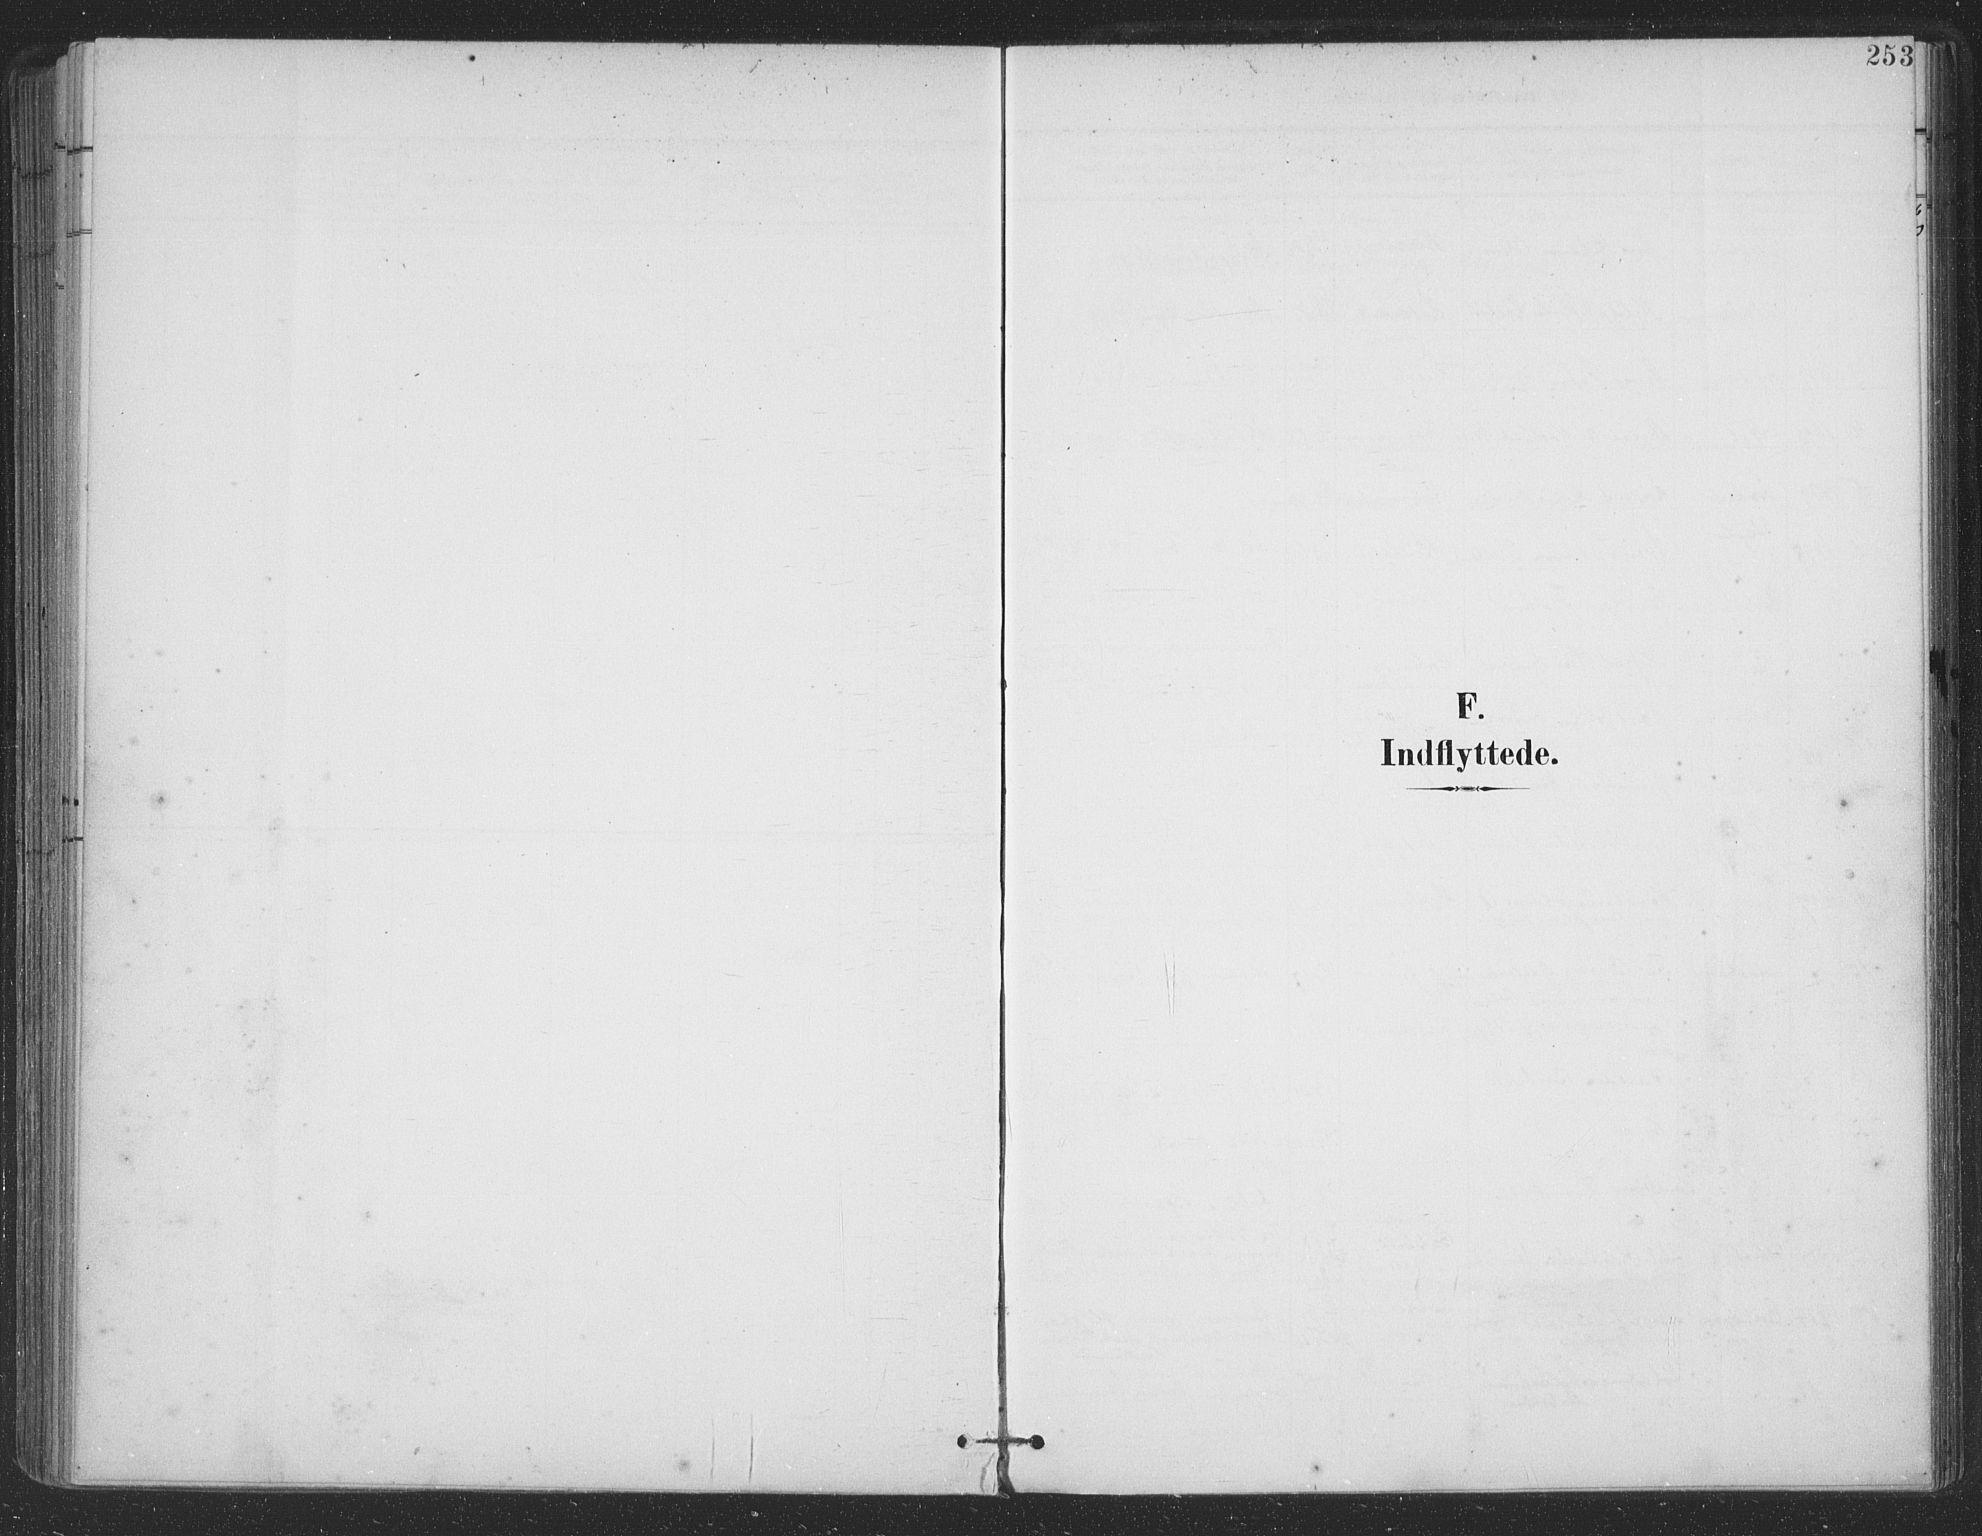 SAT, Ministerialprotokoller, klokkerbøker og fødselsregistre - Nordland, 863/L0899: Ministerialbok nr. 863A11, 1897-1906, s. 253